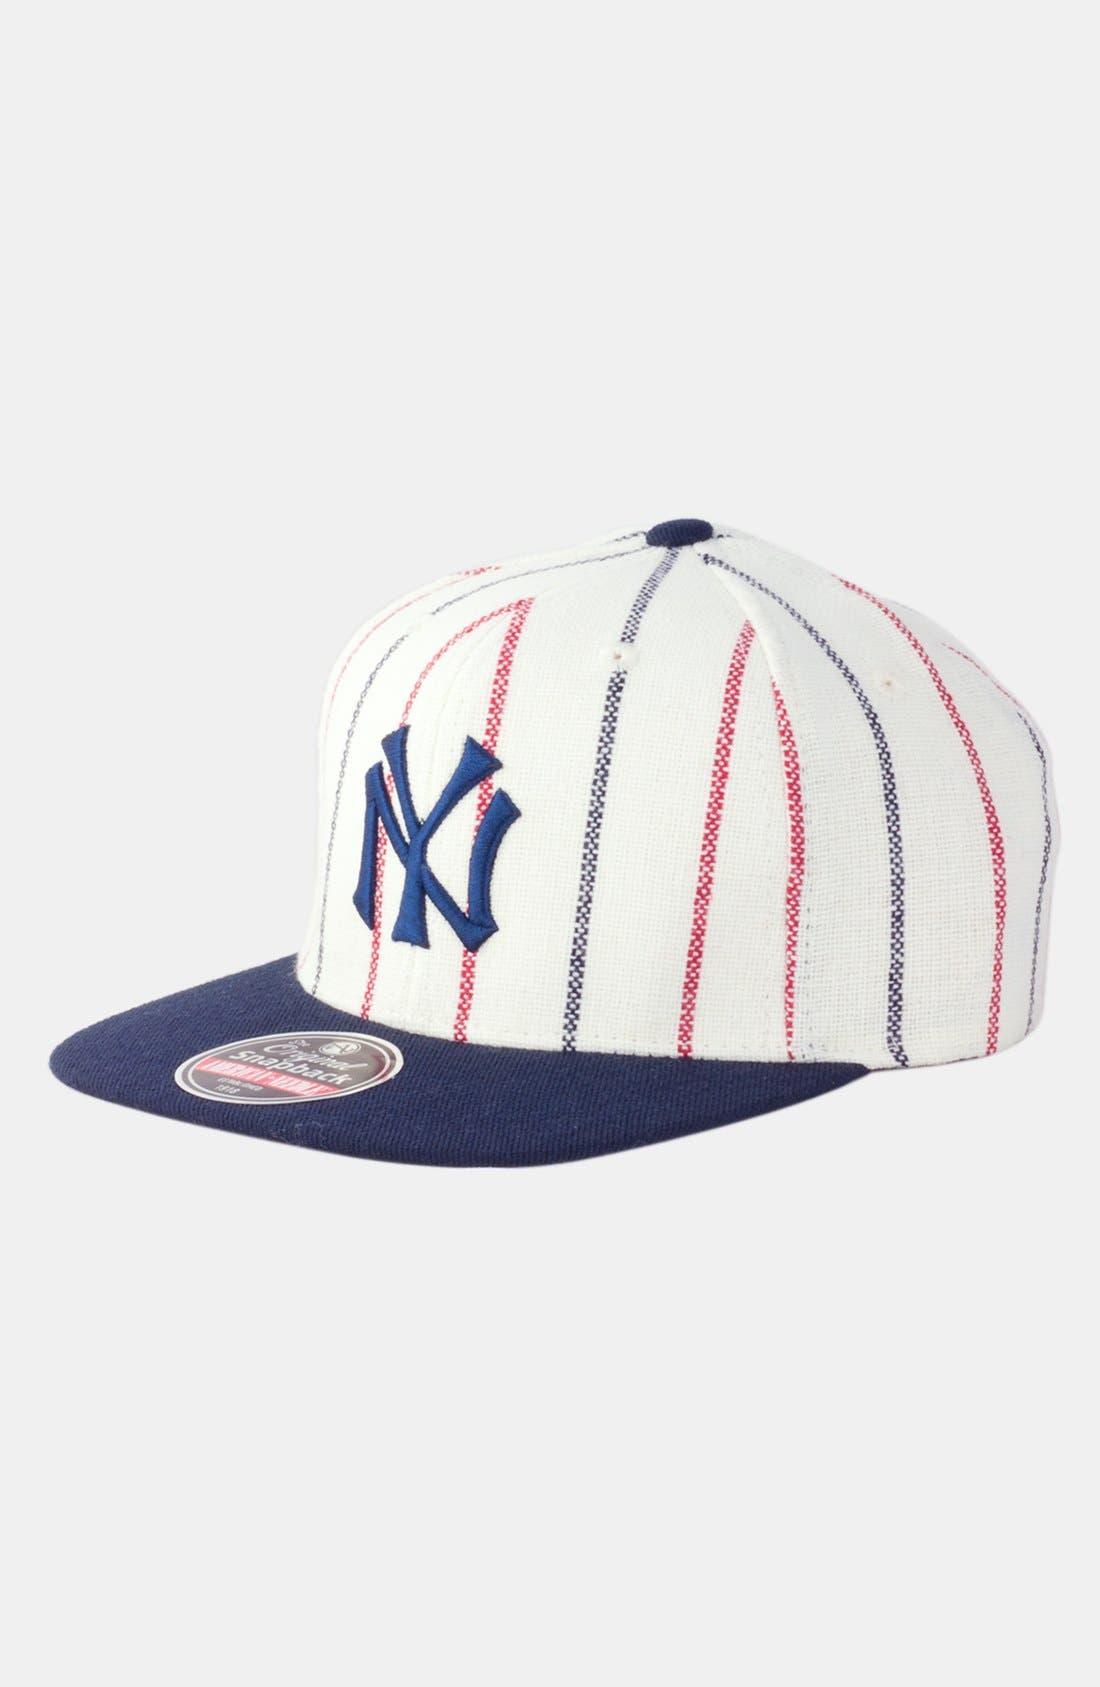 Alternate Image 1 Selected - American Needle 'New York Yankees 1916 - 400 Series' Snapback Baseball Cap